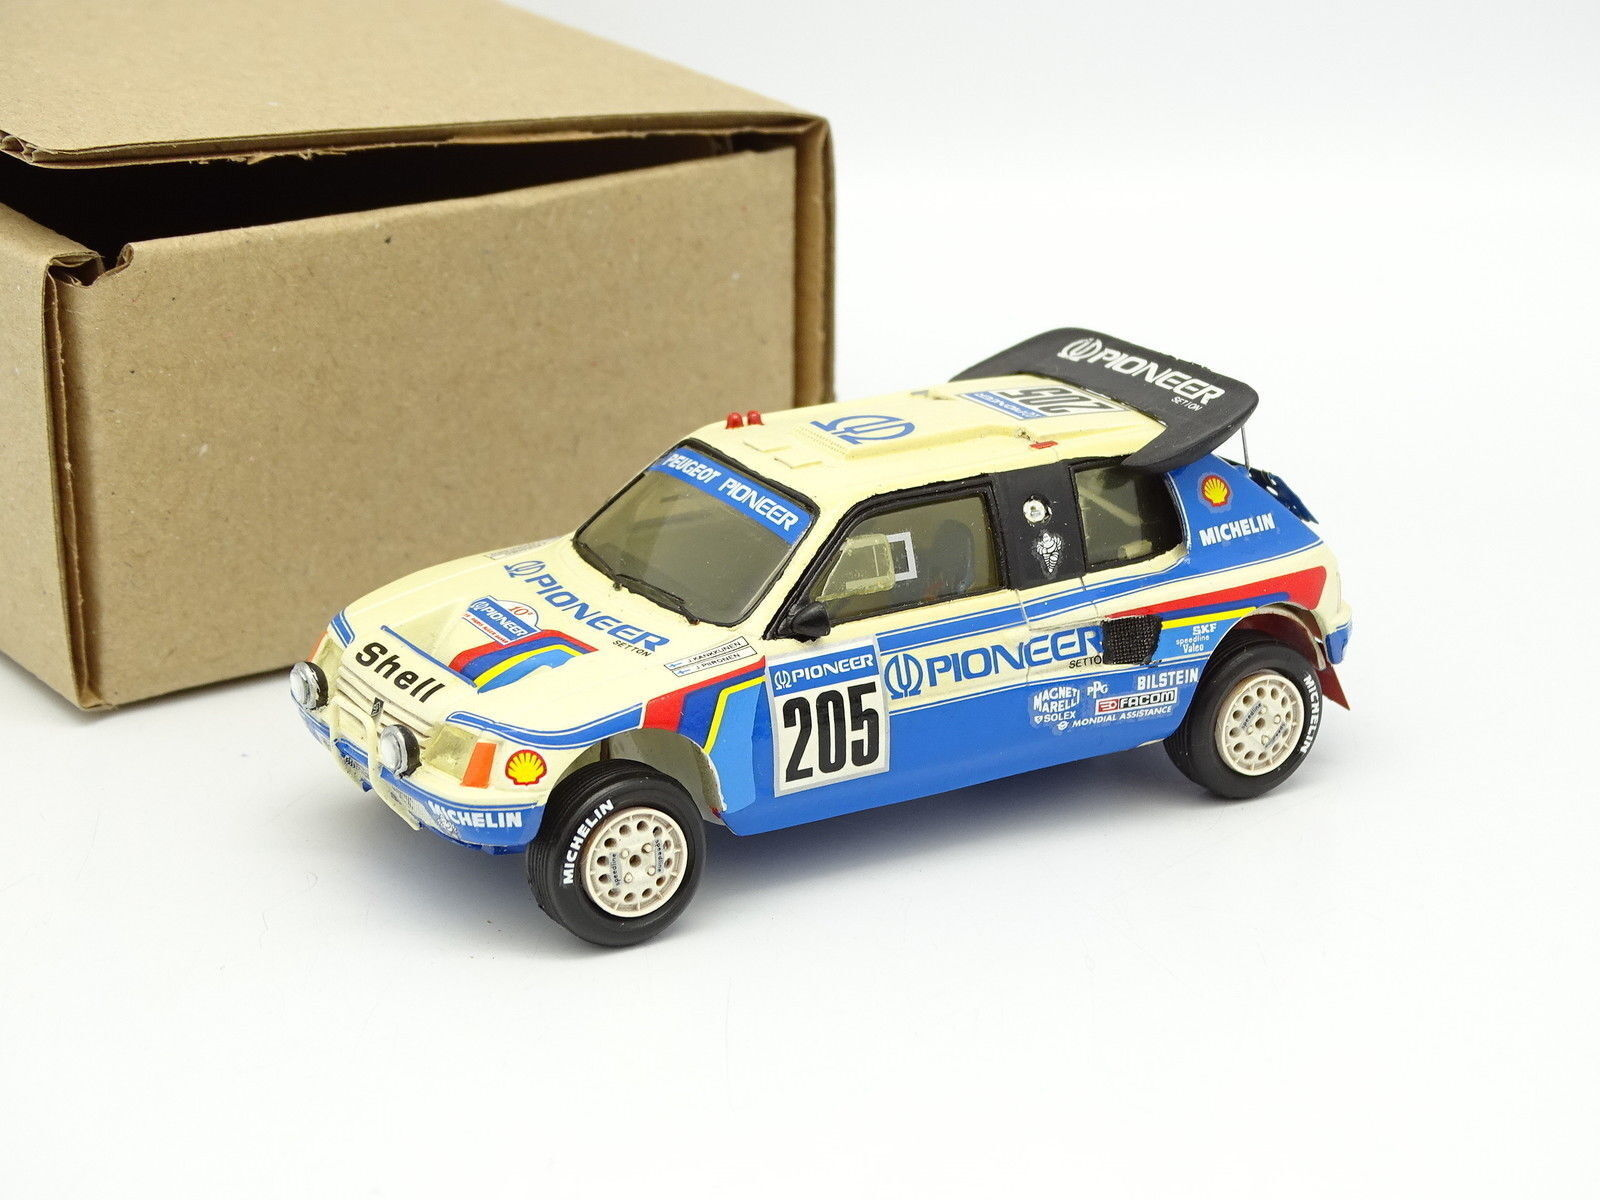 Provence Moulding Kit Assembled 1 43 Peugeot 205 T16 No.205 Rally Paris Dakar